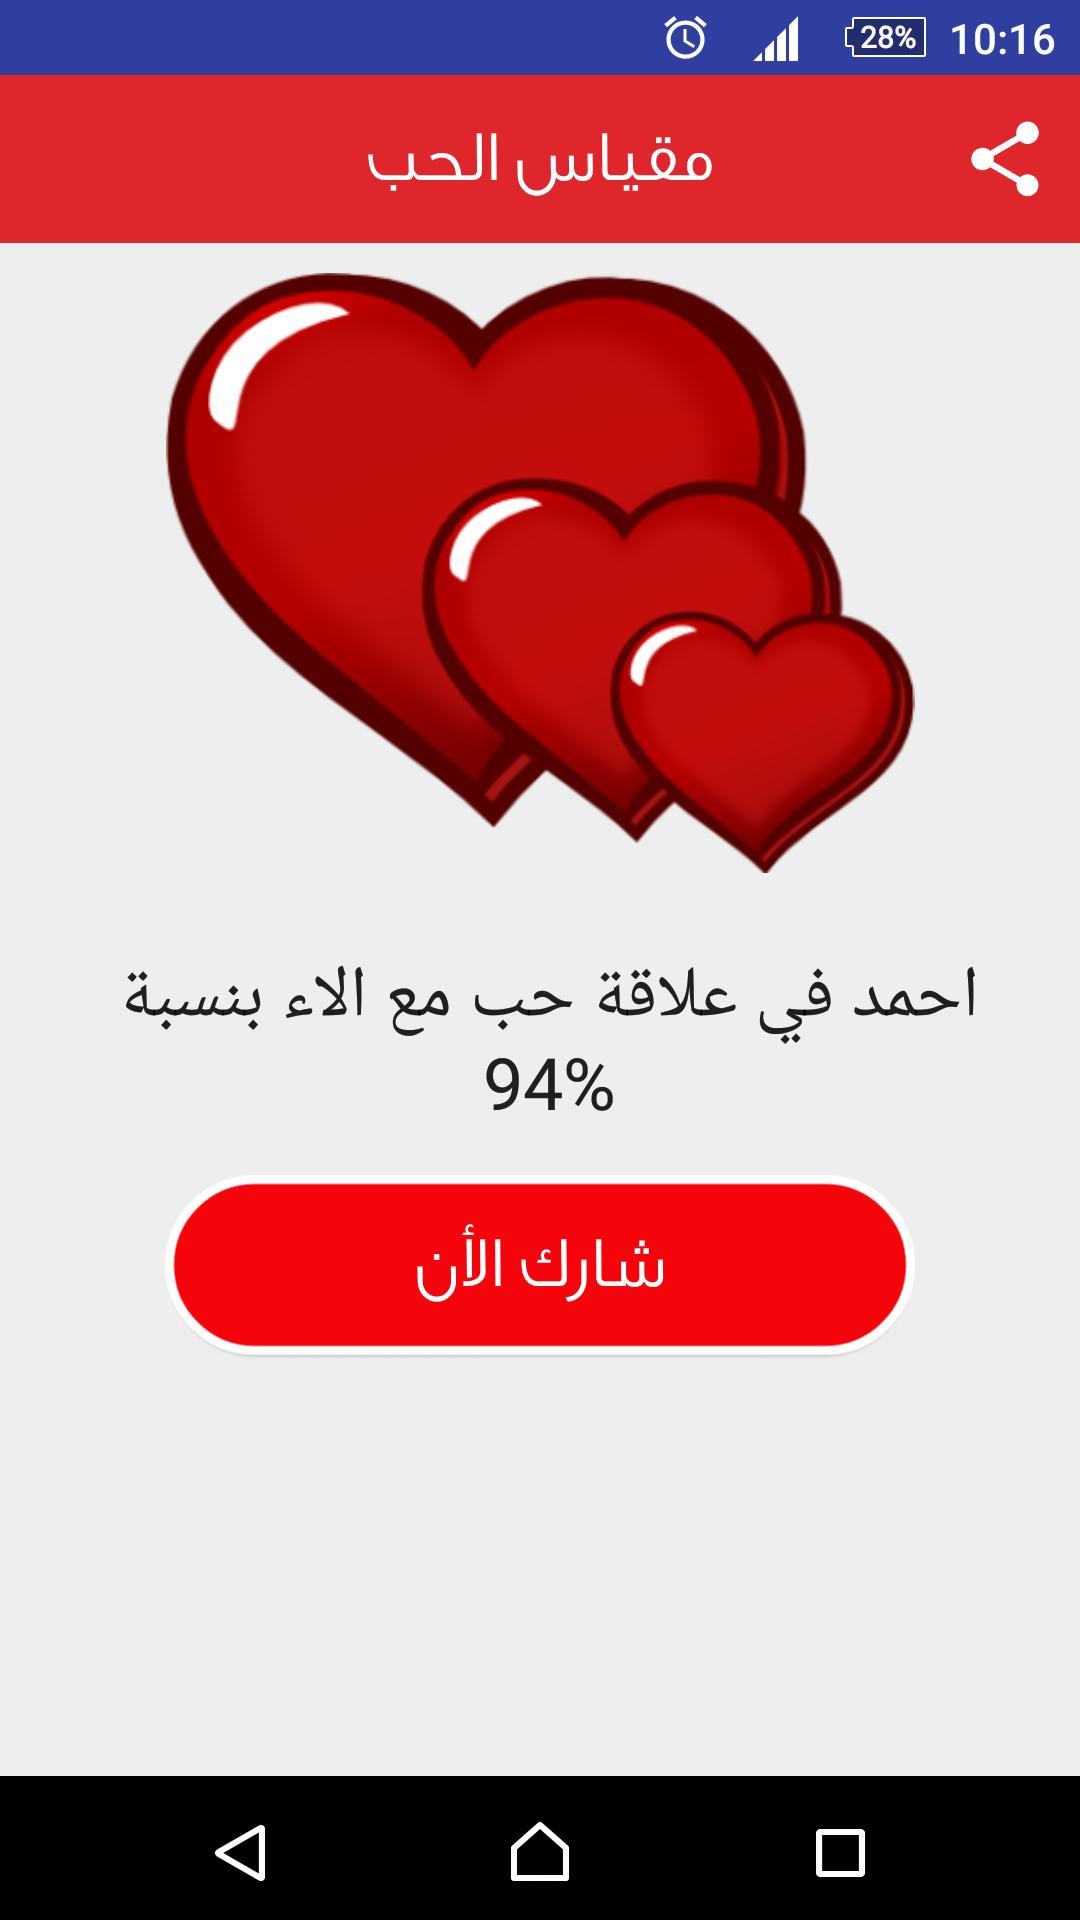 مقياس الحب بين شخصين For Android Apk Download